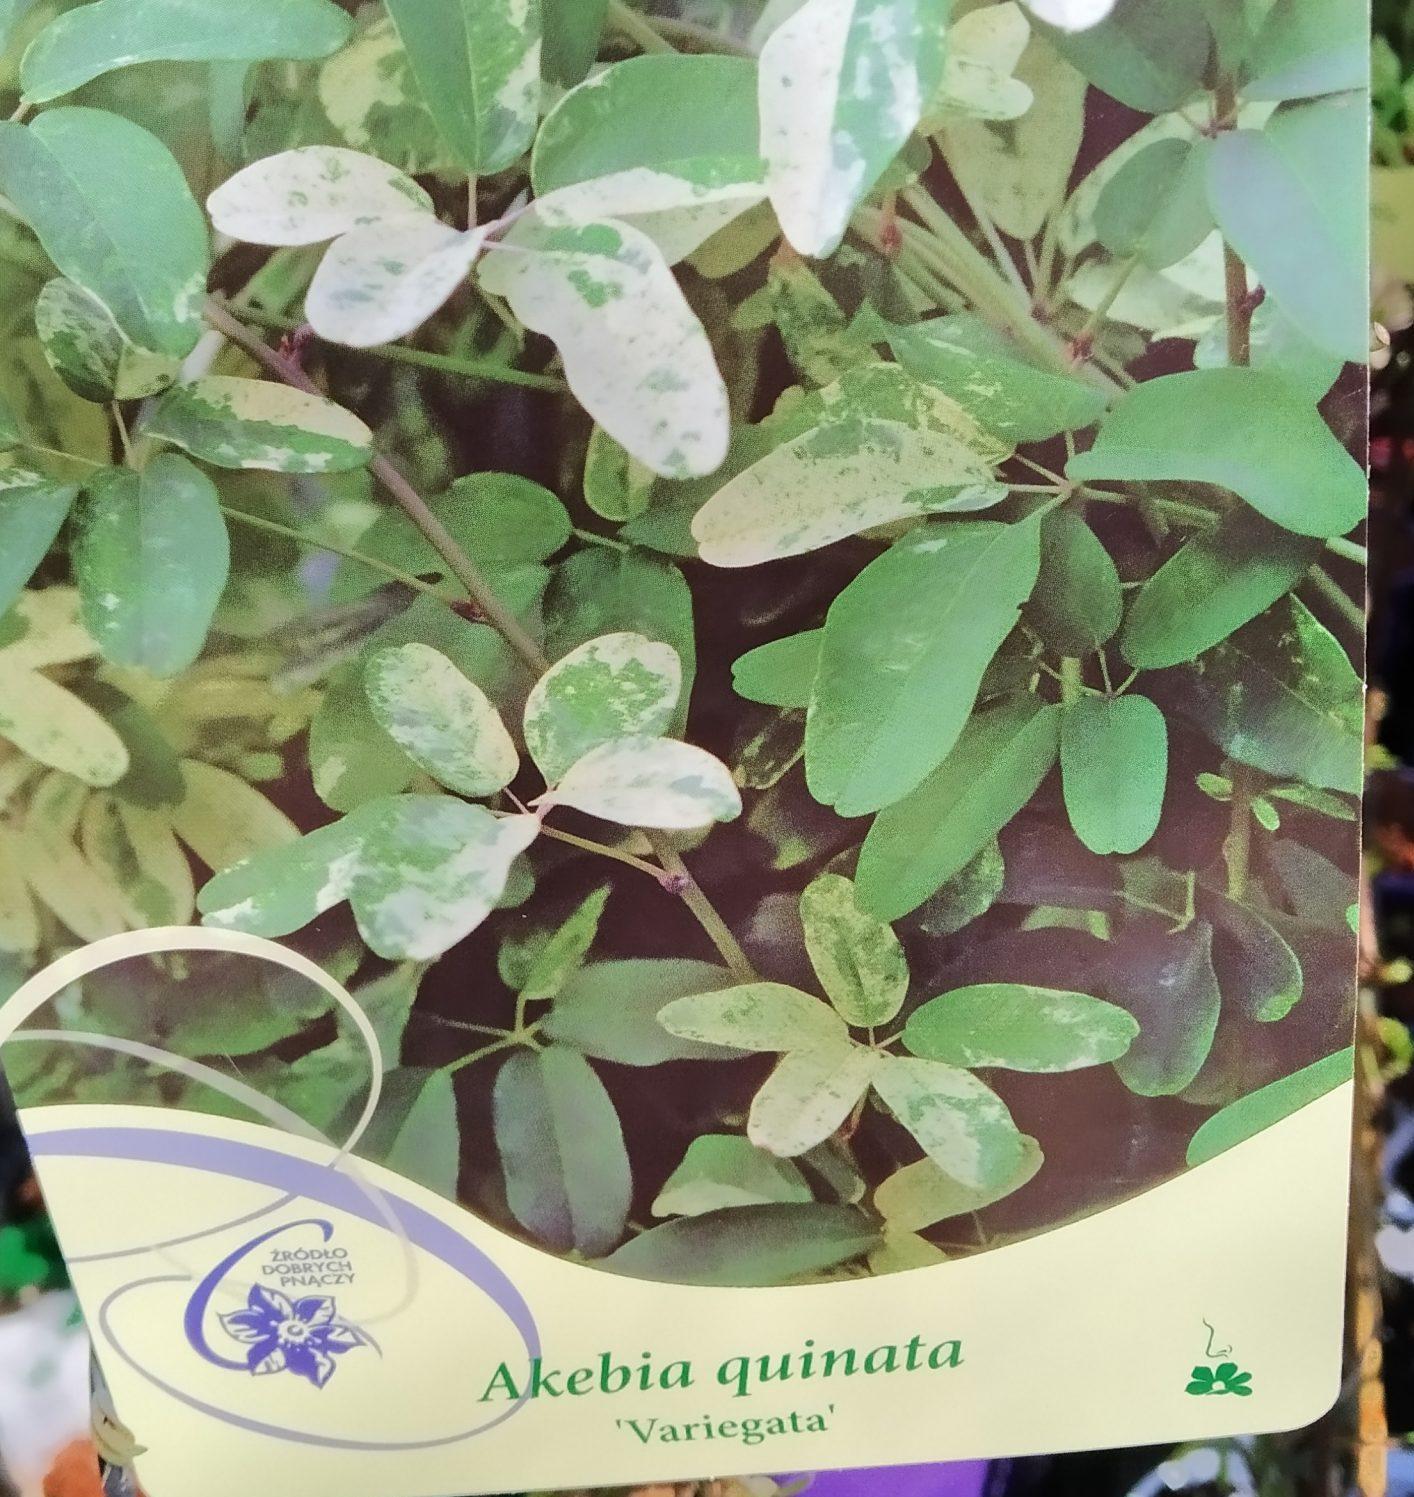 Akebia Quinata 'Variegata'